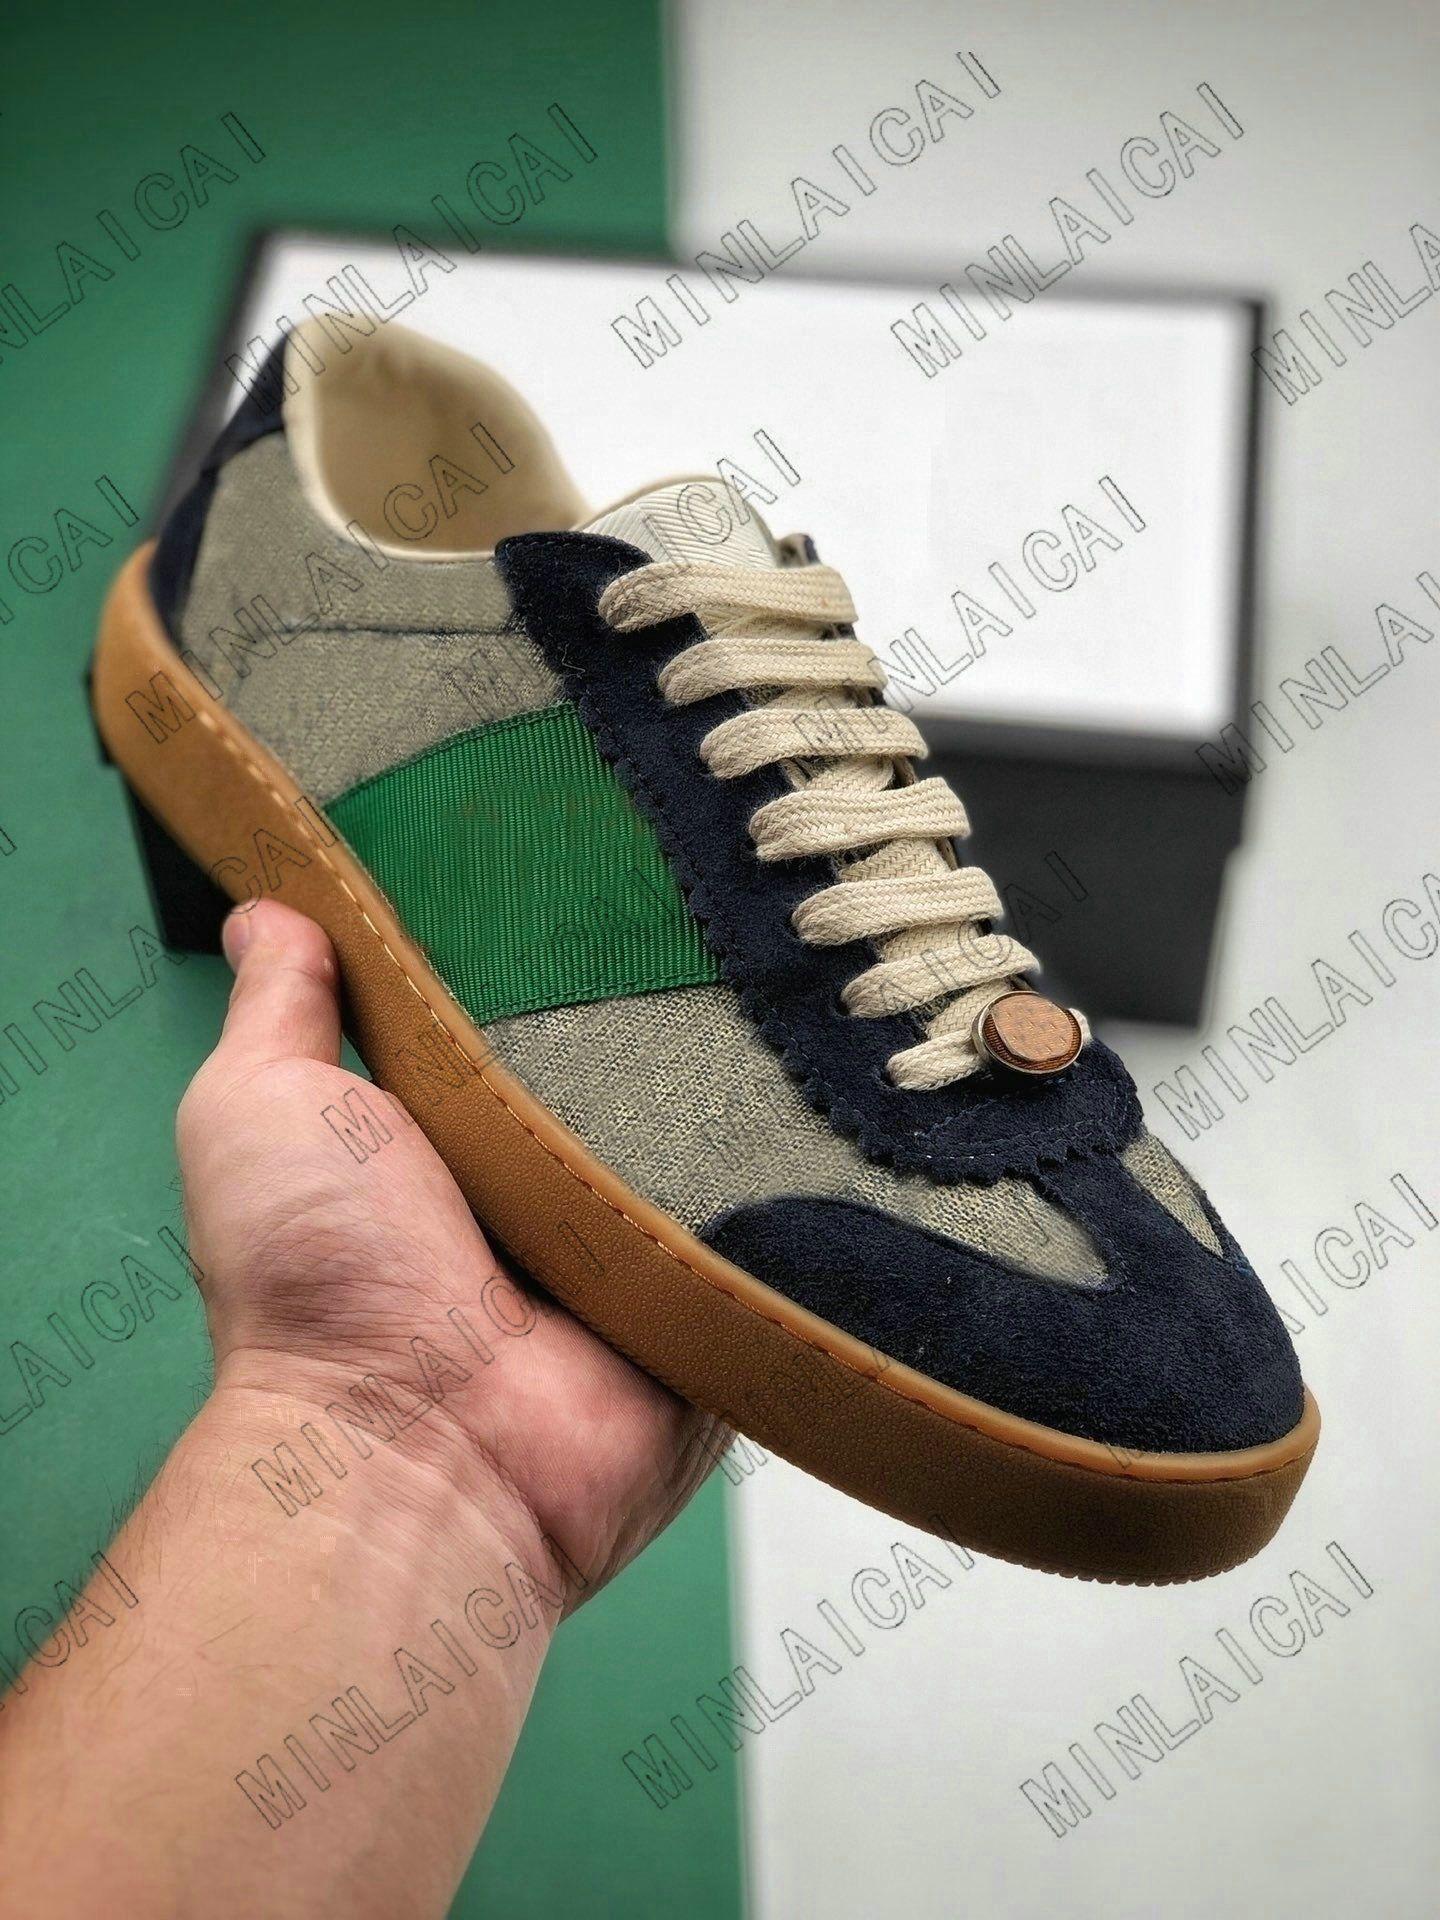 Herren bestickte Distressed Leder Screener Ass grün rote Streifen Italien Sneakers Luxurys Designer Trainer Lace Up Low Cut Man Casual Schuhe